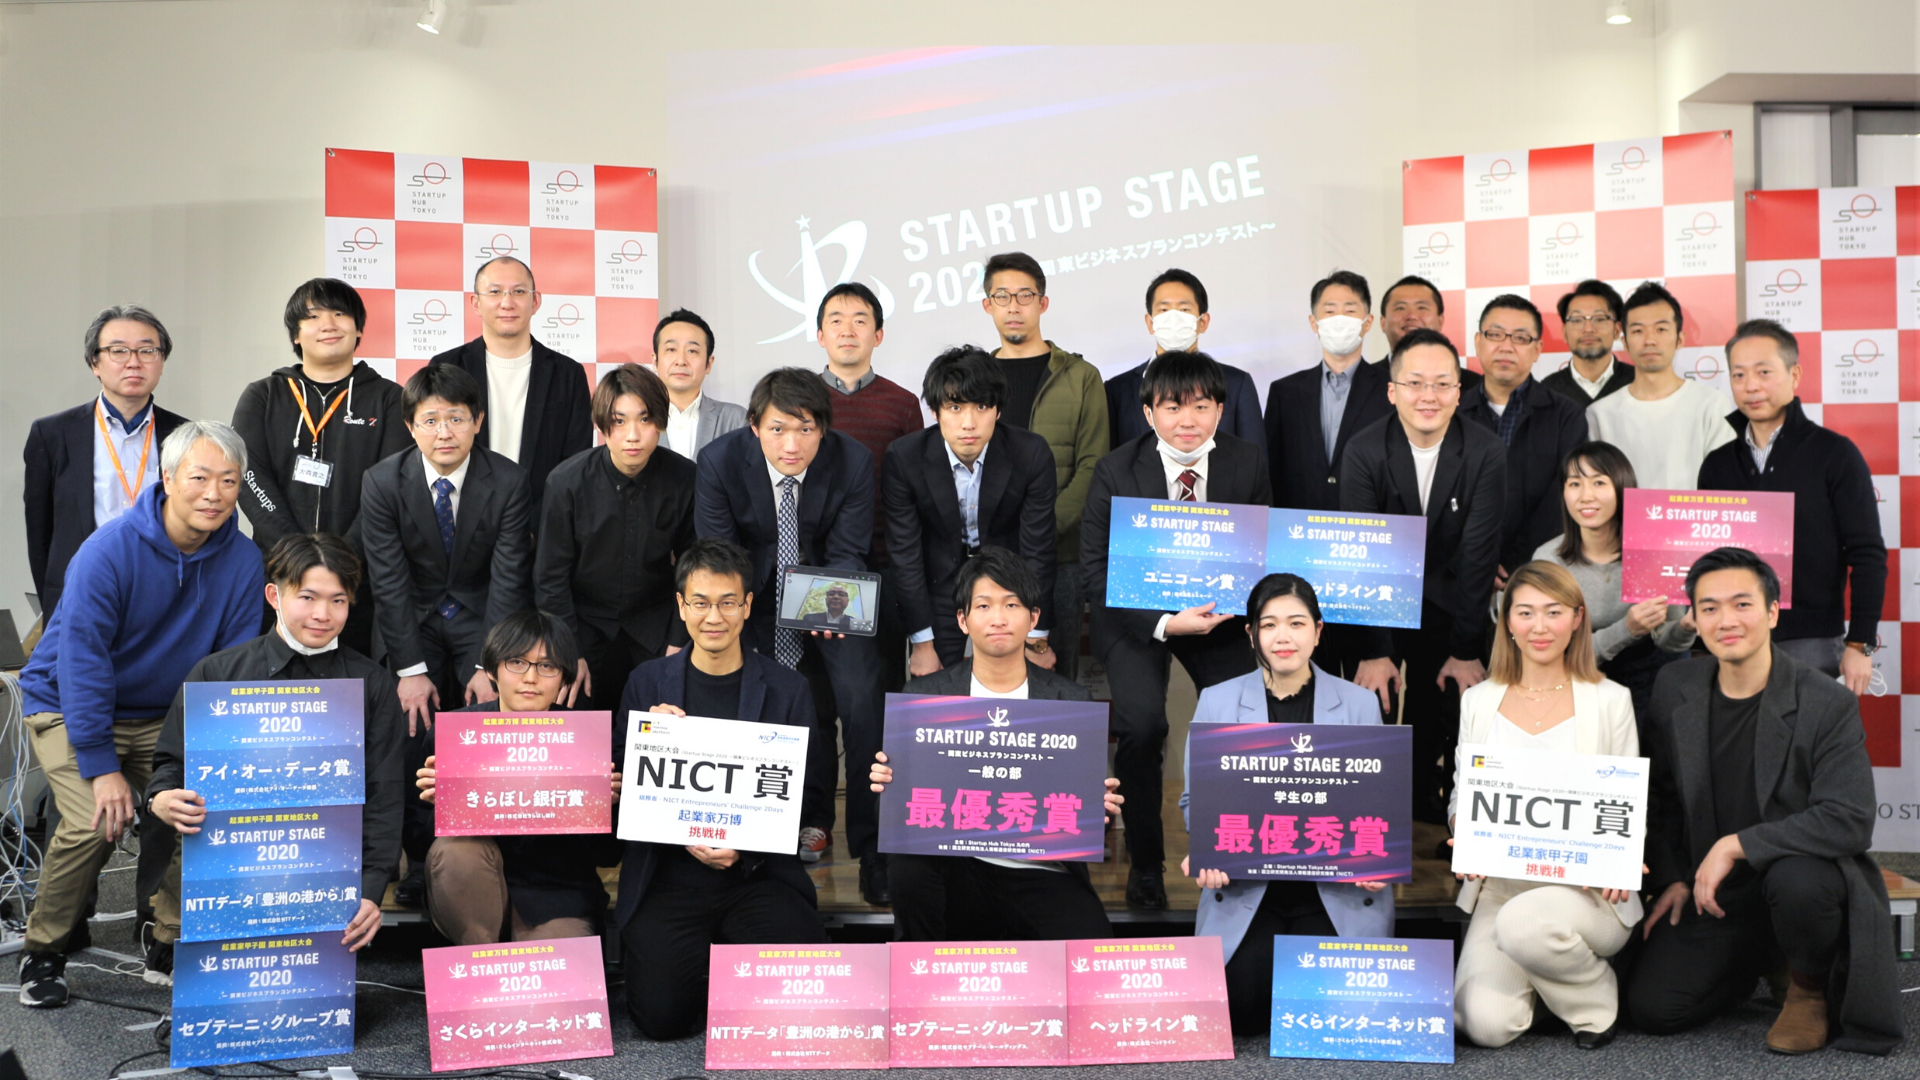 Startup Hub Tokyo主催 Startup Stage 2020 メンターレポート